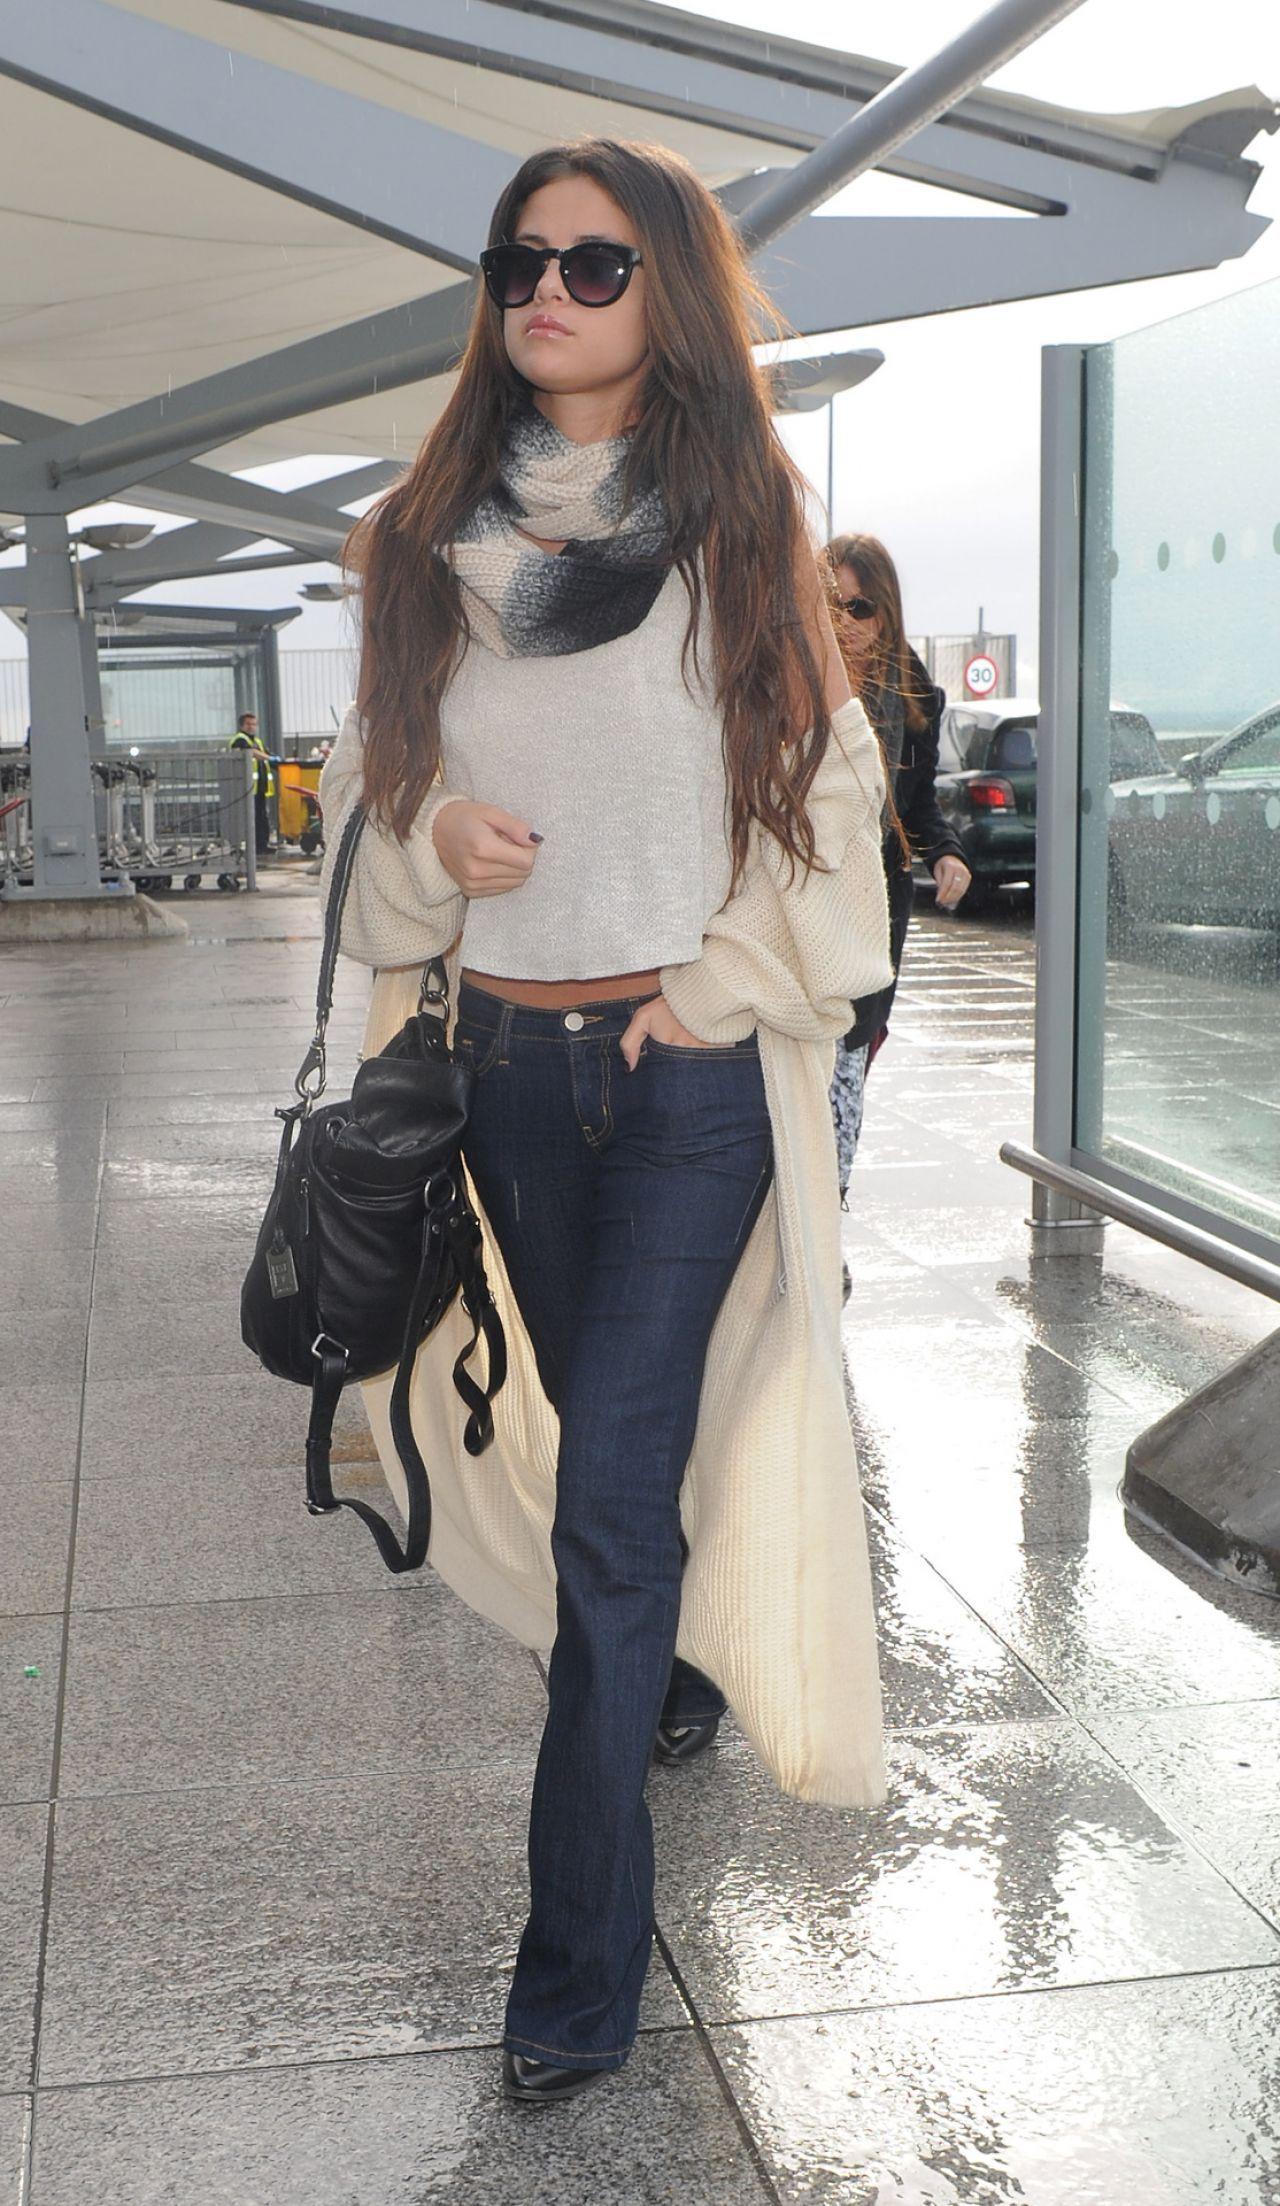 Selena Gomez Street Style - At Heathrow Airport in London, February 2014